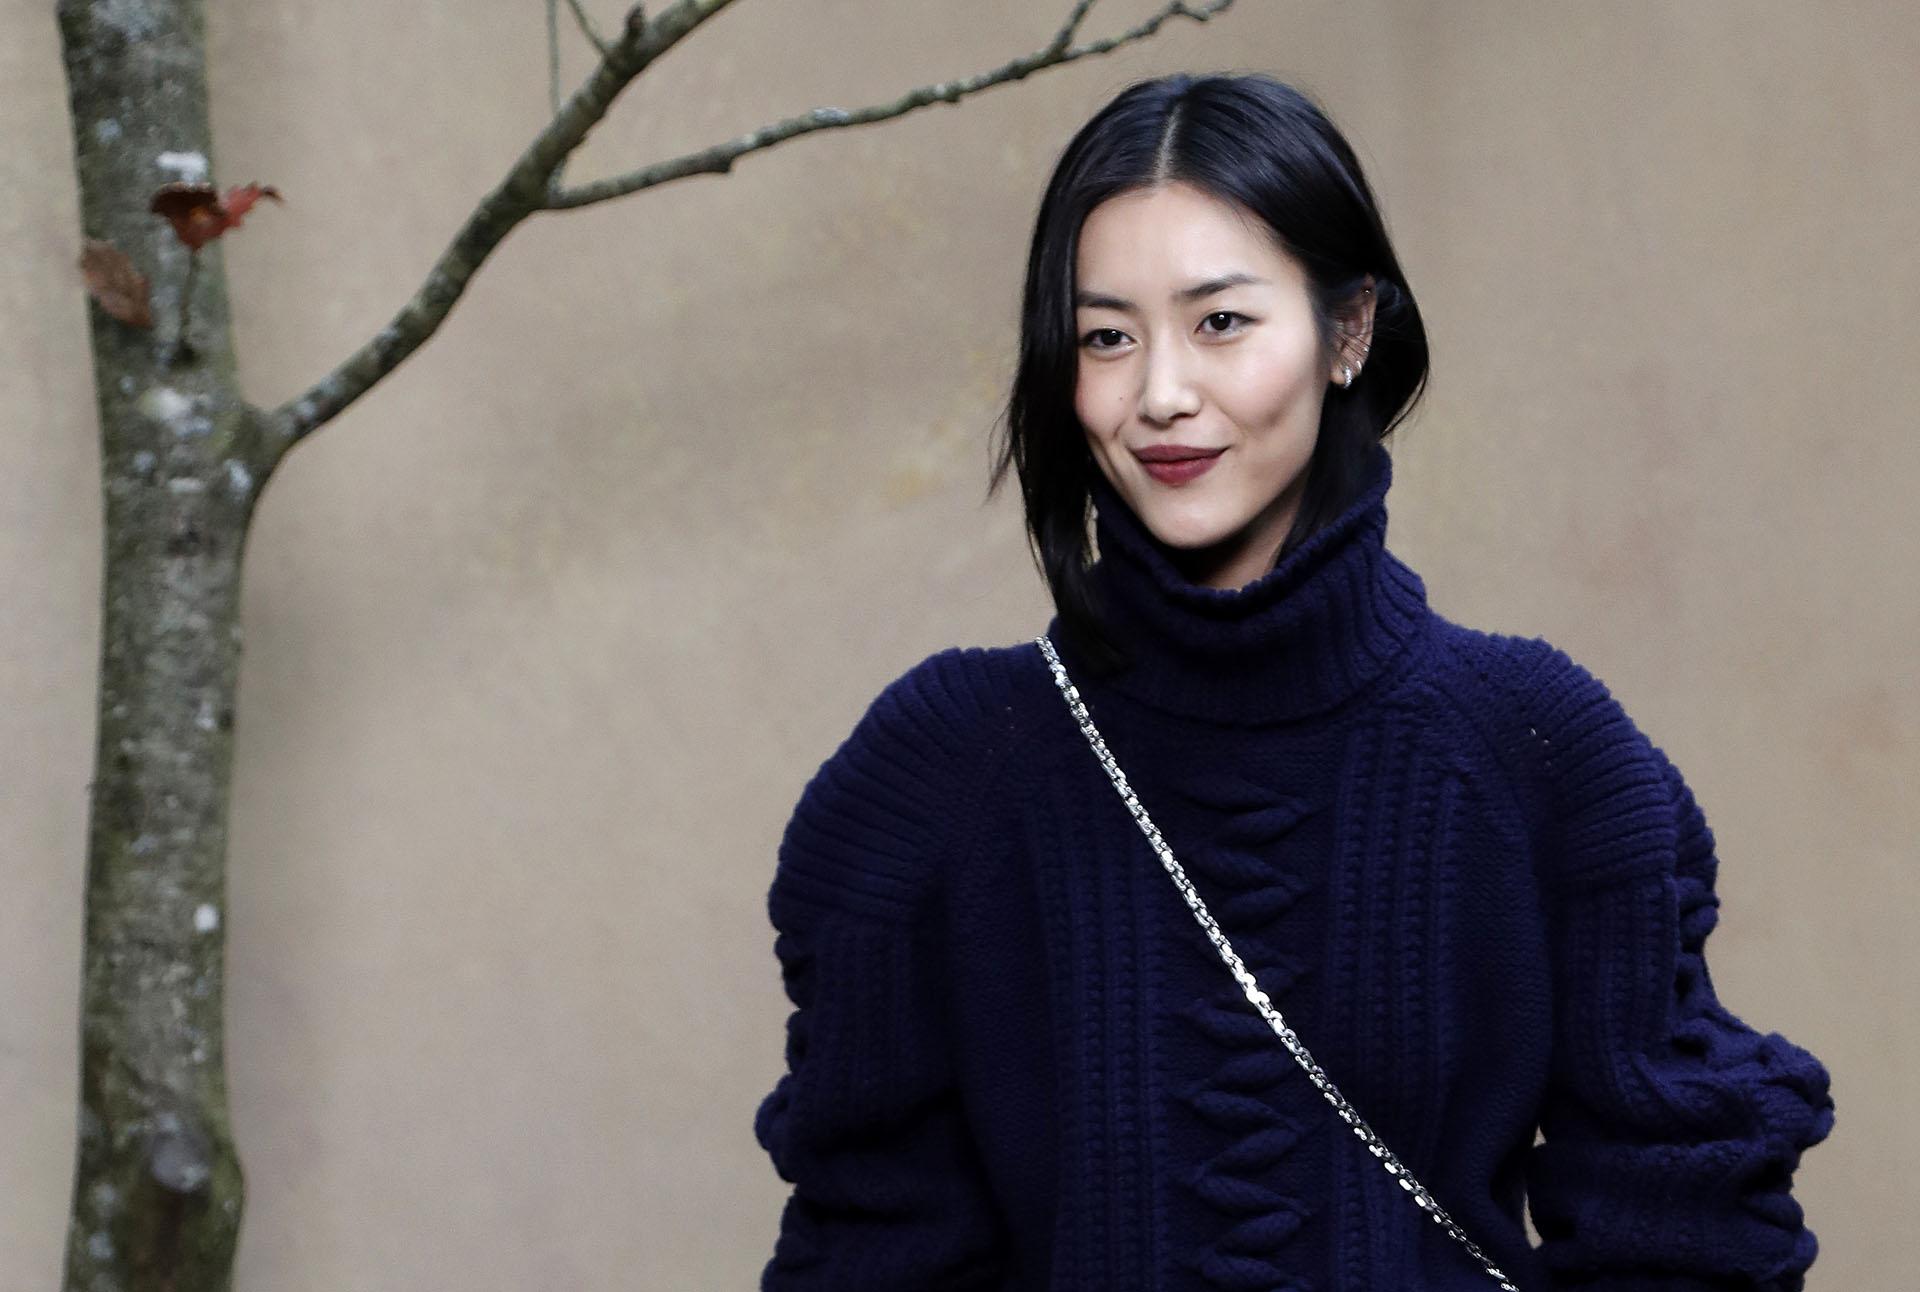 La modelo topLiu Wen fanática de la firma francesa